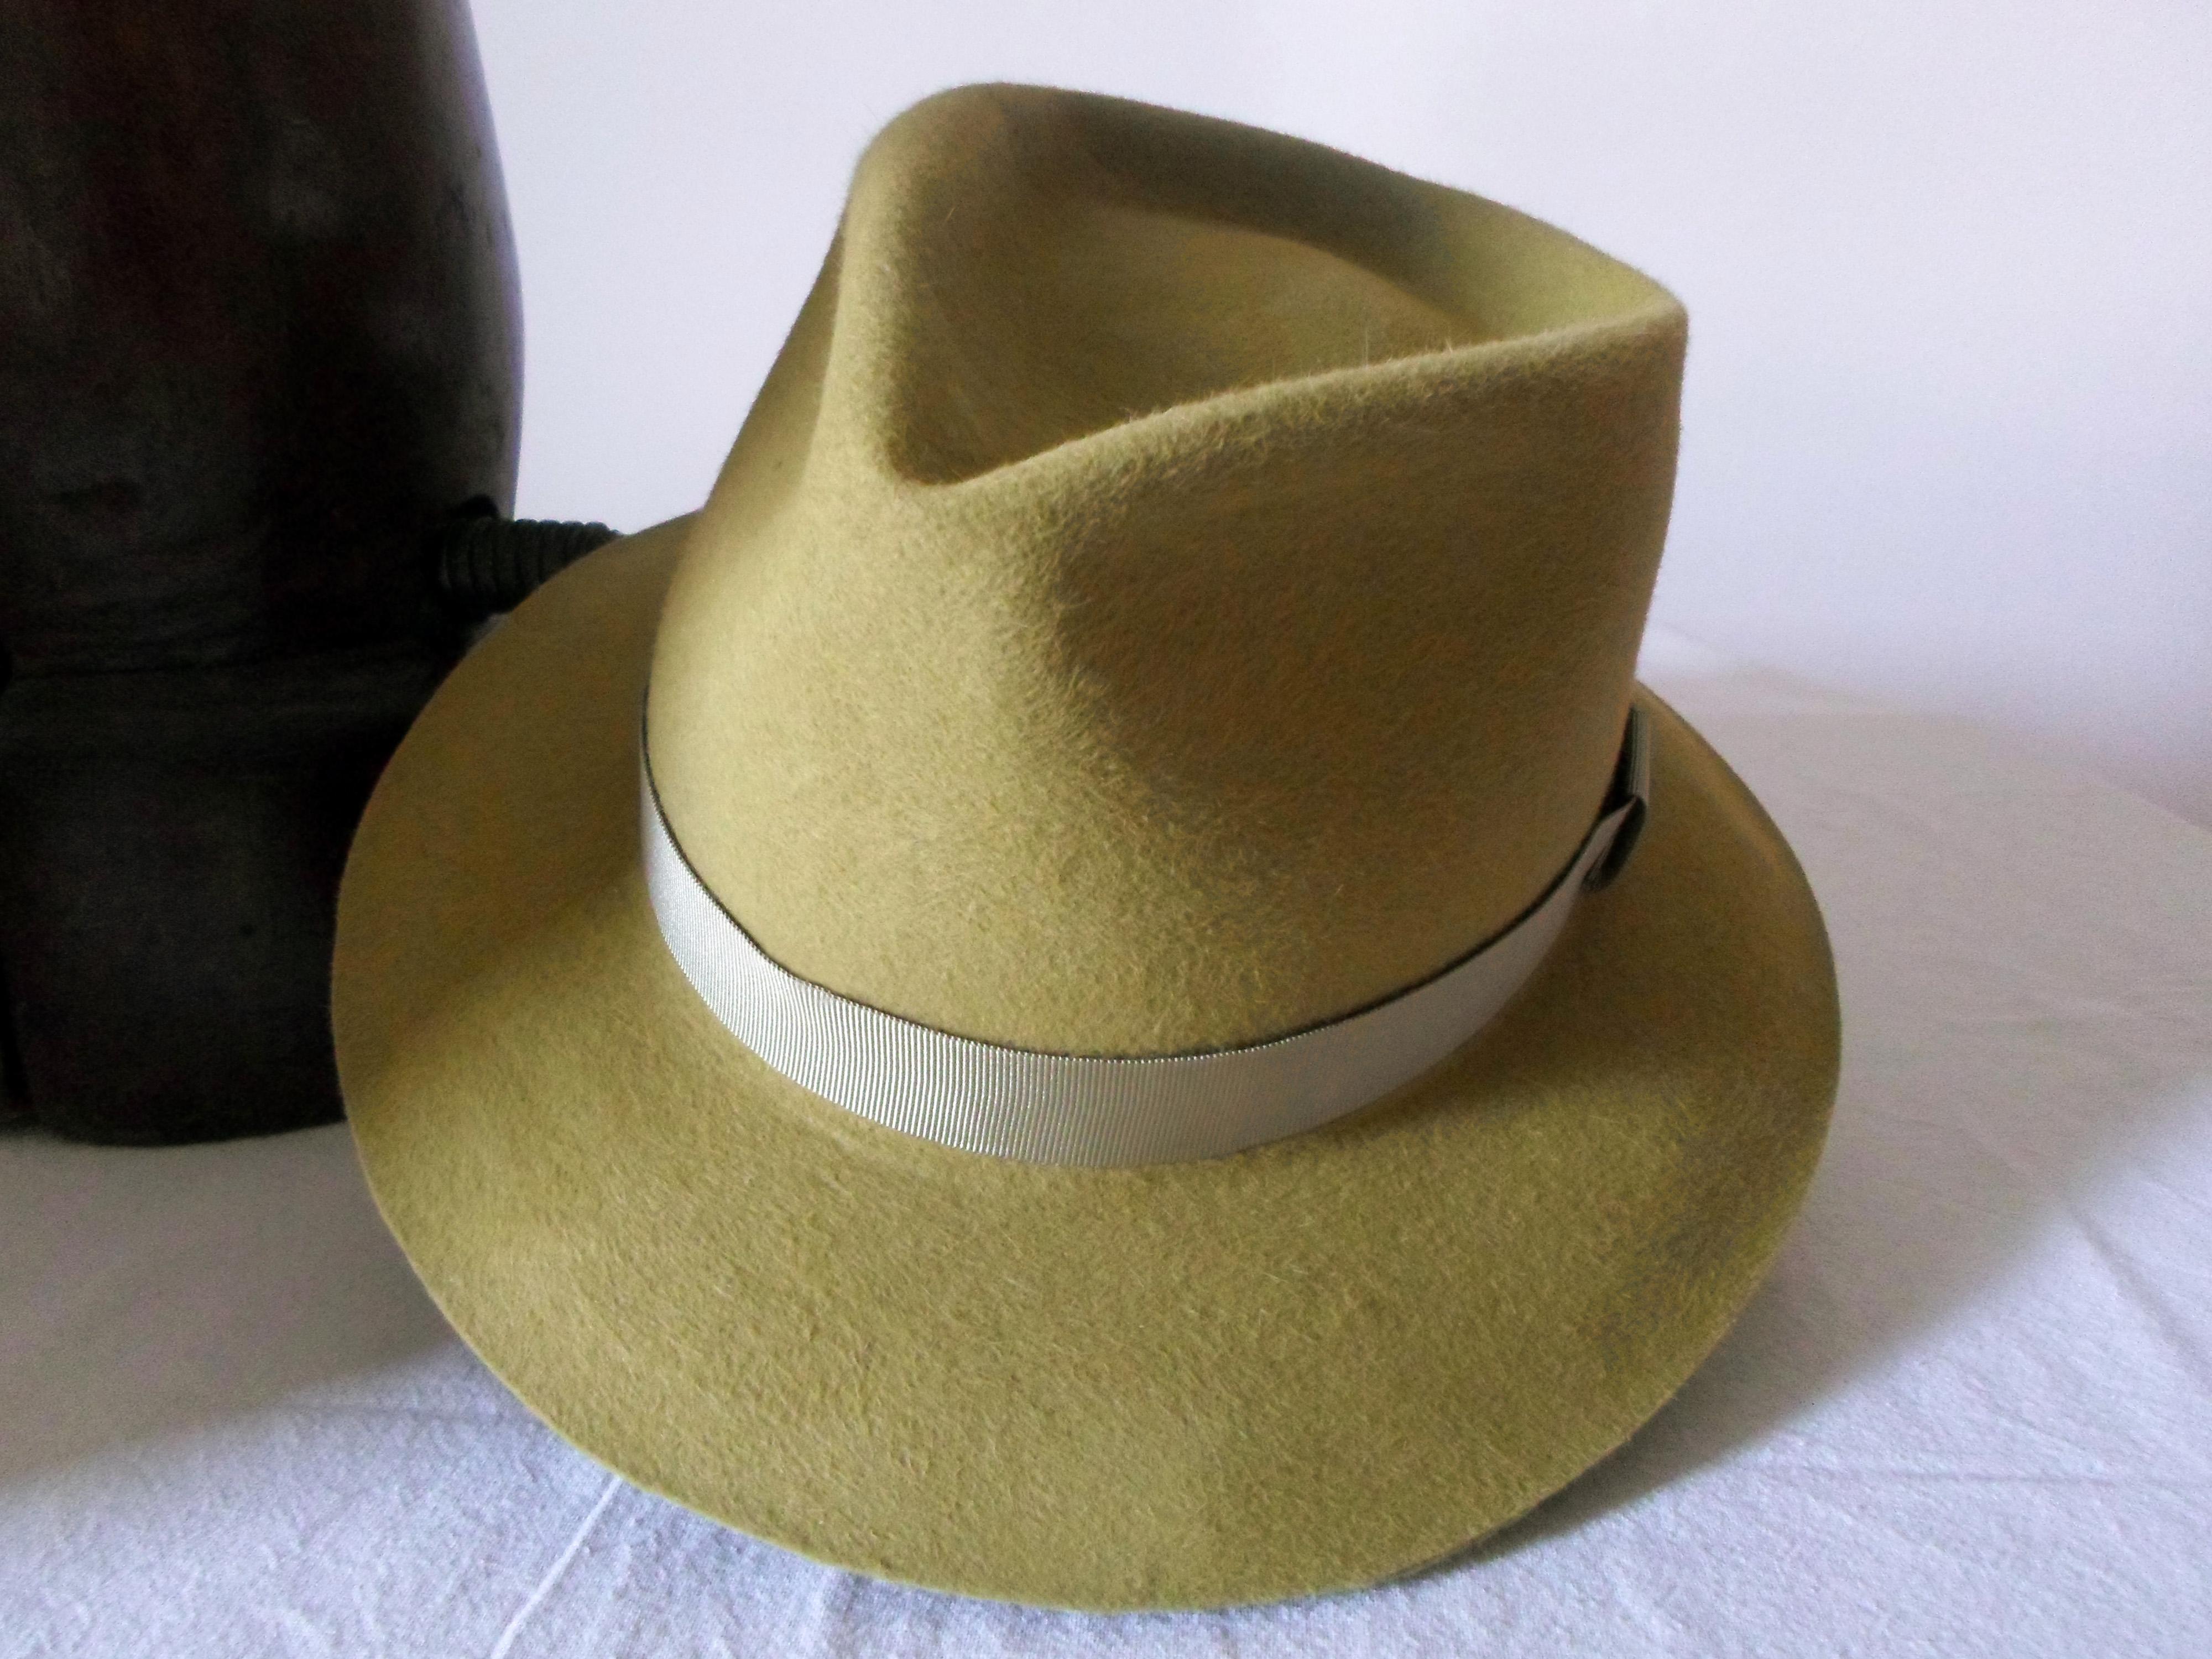 7a5b6bfbbb961 Mustard Yellow Wool Felt Fedora - Wide Brim Merino Wool Felt ...